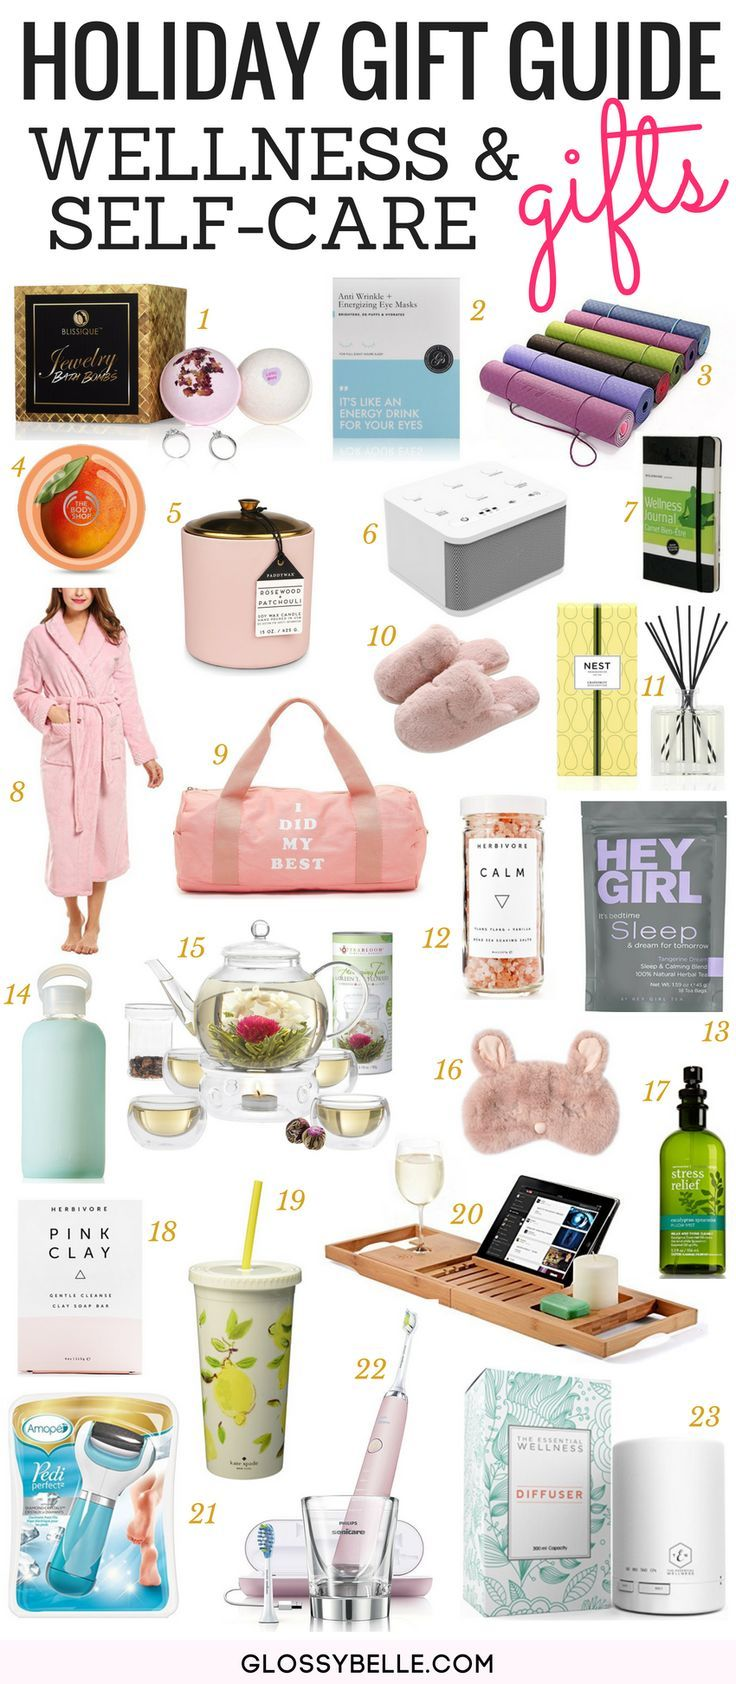 Holiday <b>Gift</b> Guide <b>2018</b>: 23 <b>Thoughtful</b> Wellness &amp; Self-Care <b>Gifts</b> ...